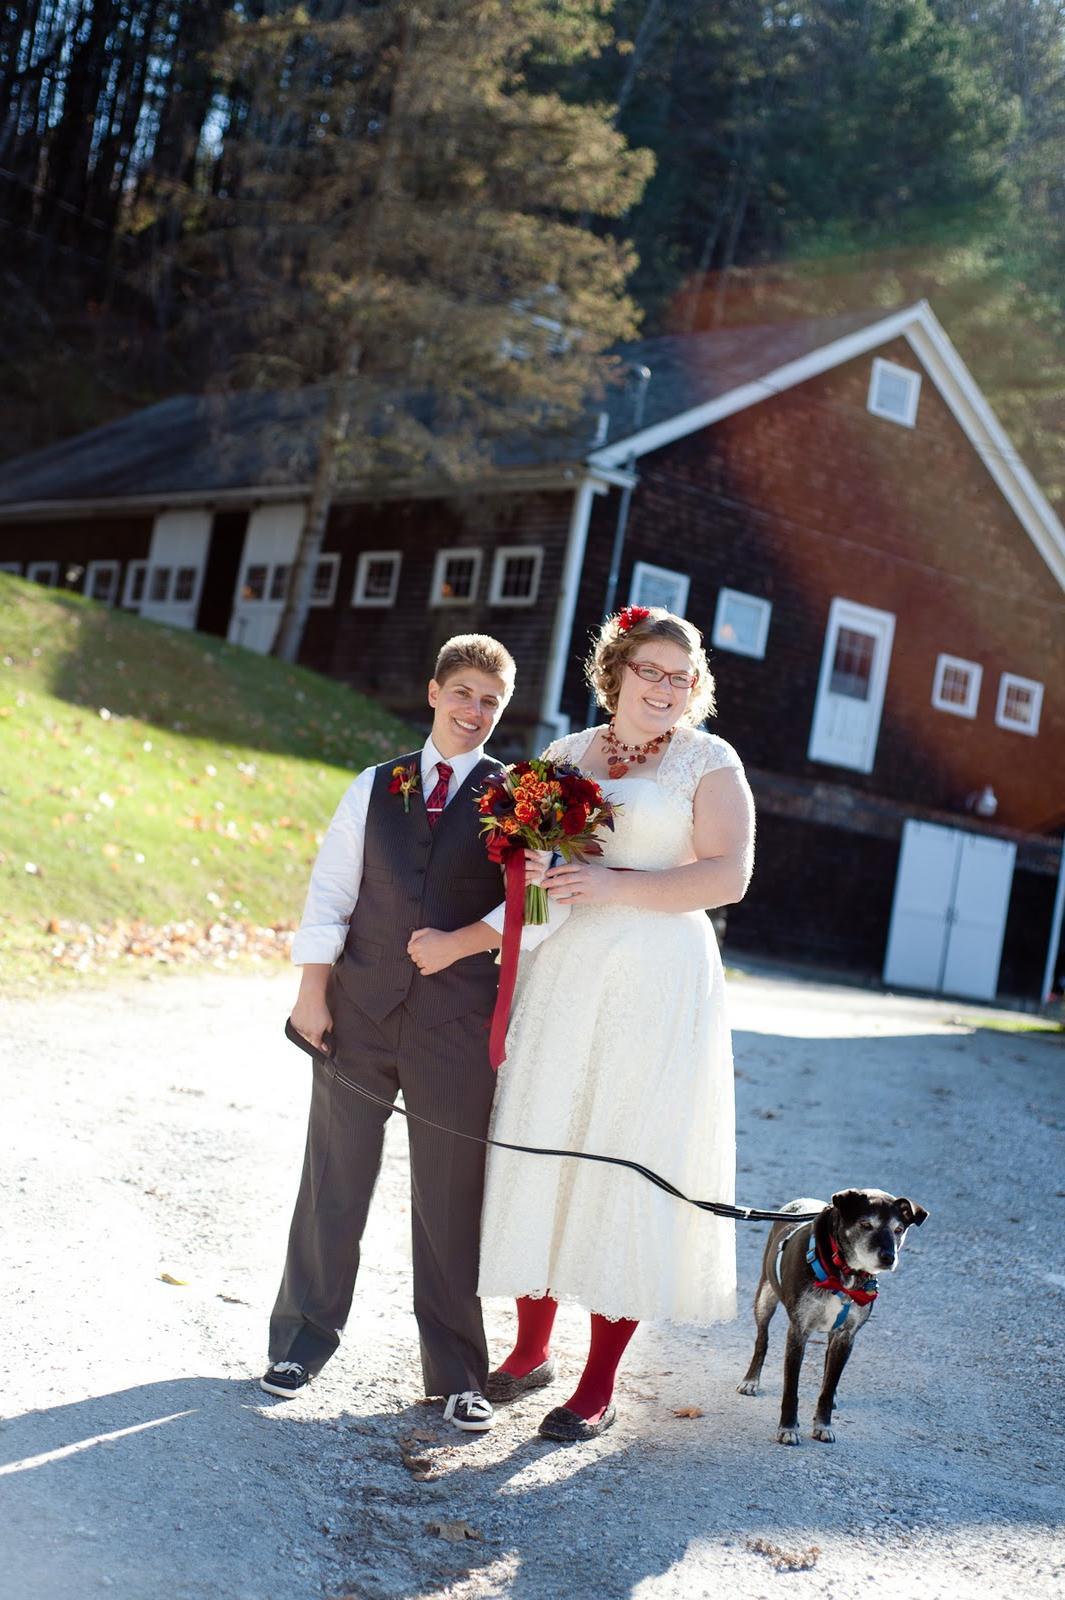 fall wedding decorations.